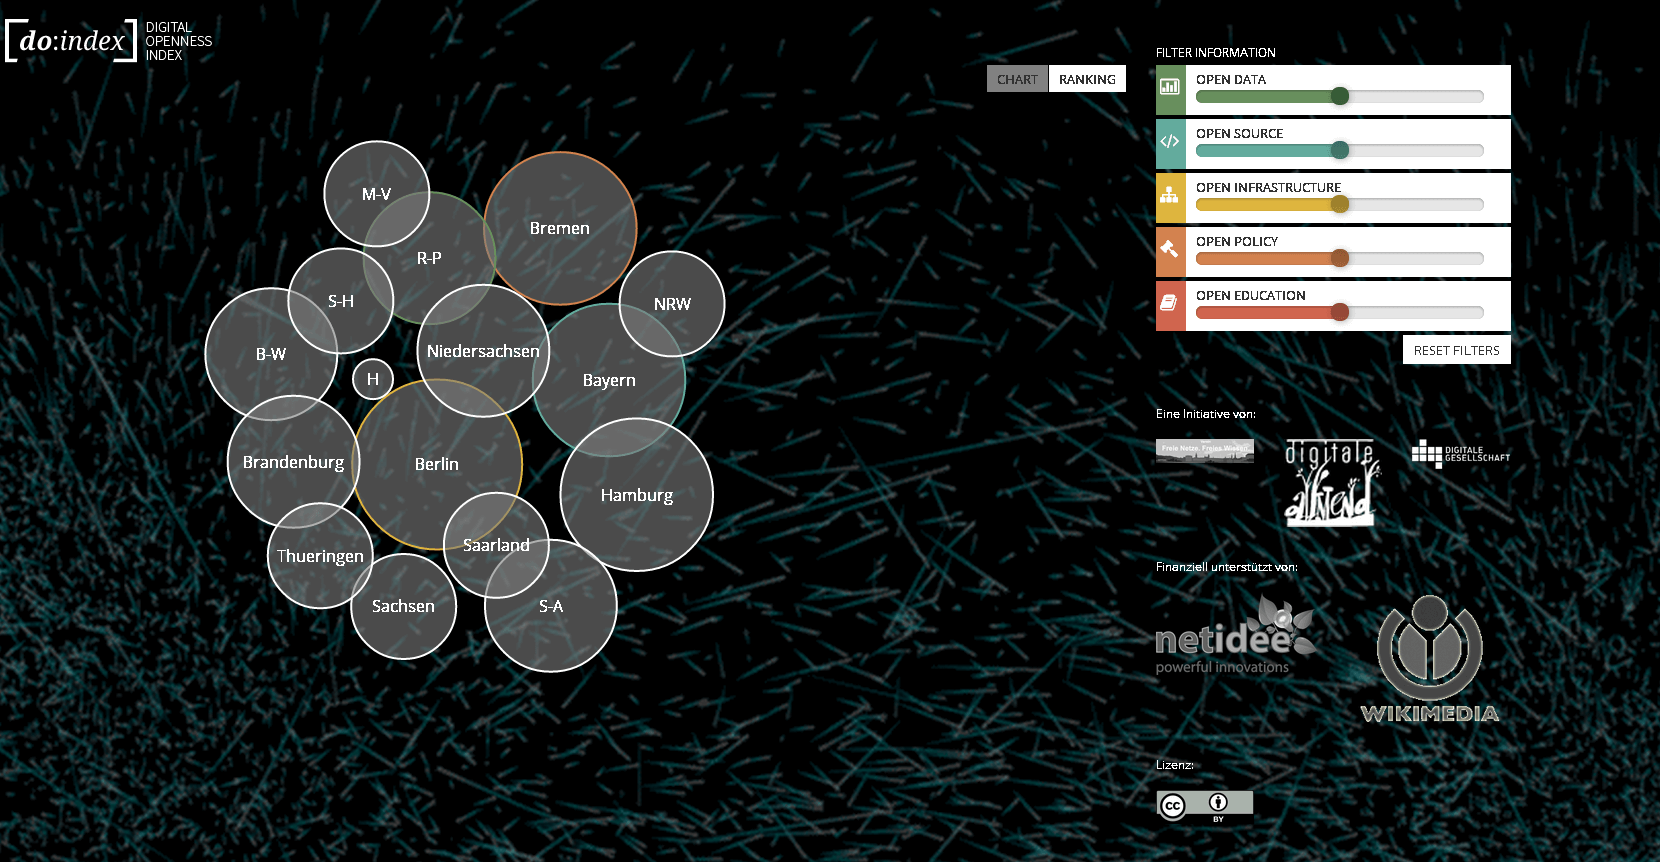 Digitaler Offenheitsindex